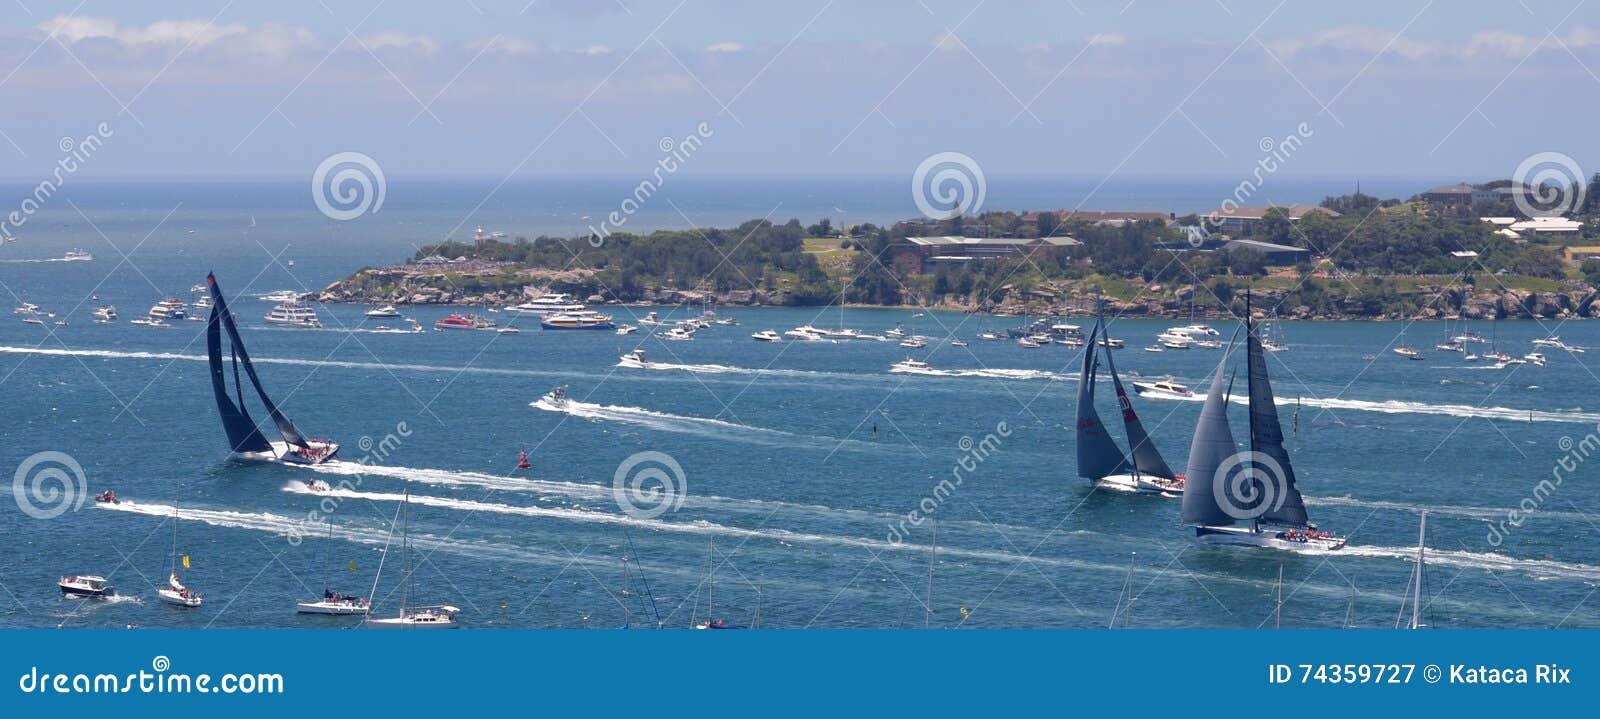 Sydney - Hobart Yacht Race 2014